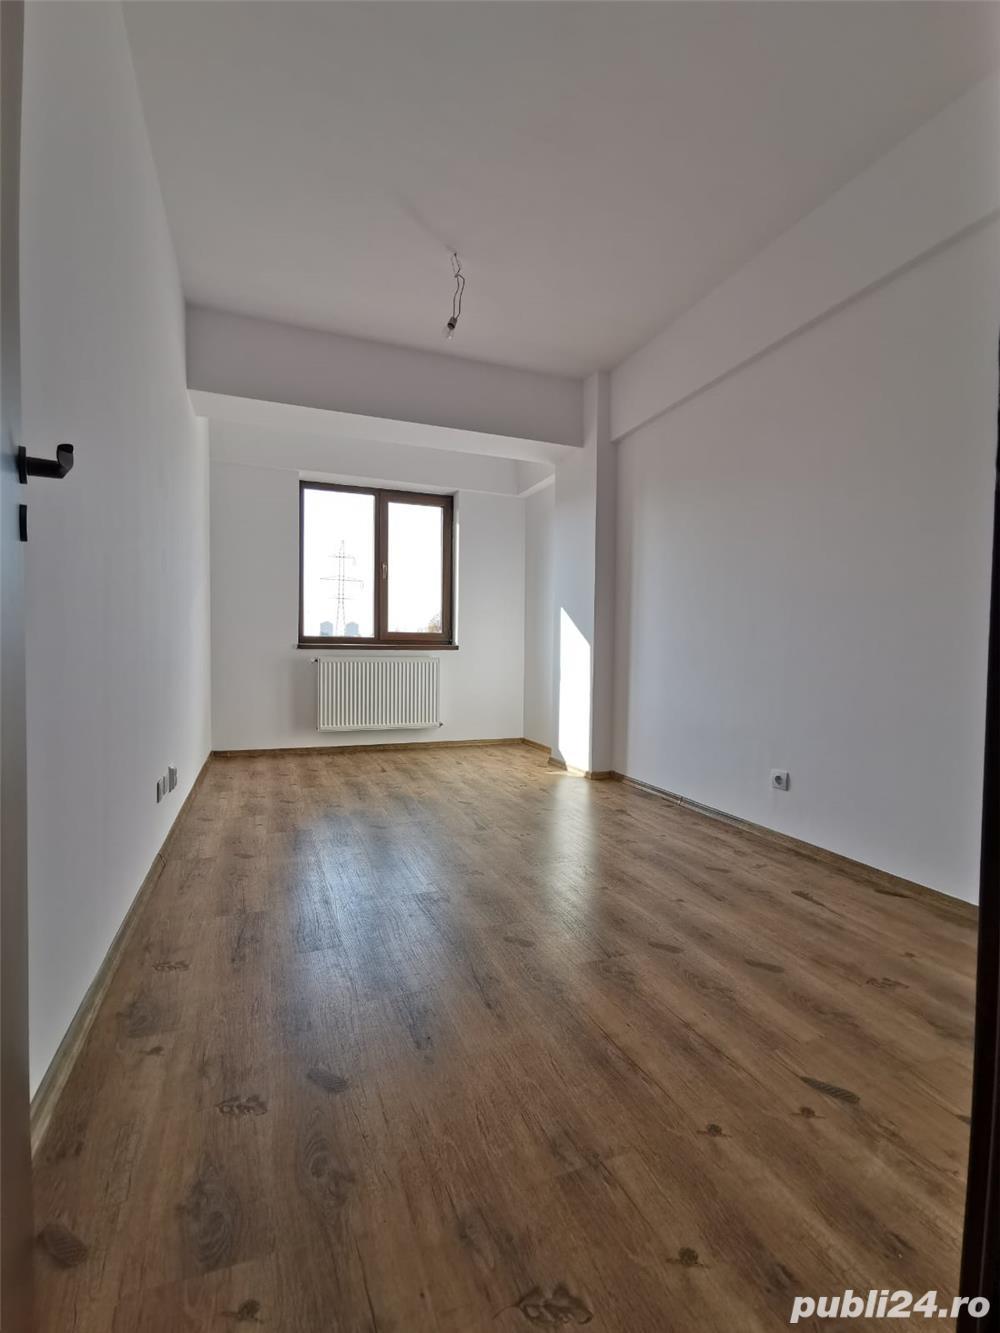 Sos. Oltenitei - LIDL - Gama Residence - Apartament 2 camere 50mp - DISPONIBIL IMEDIAT!